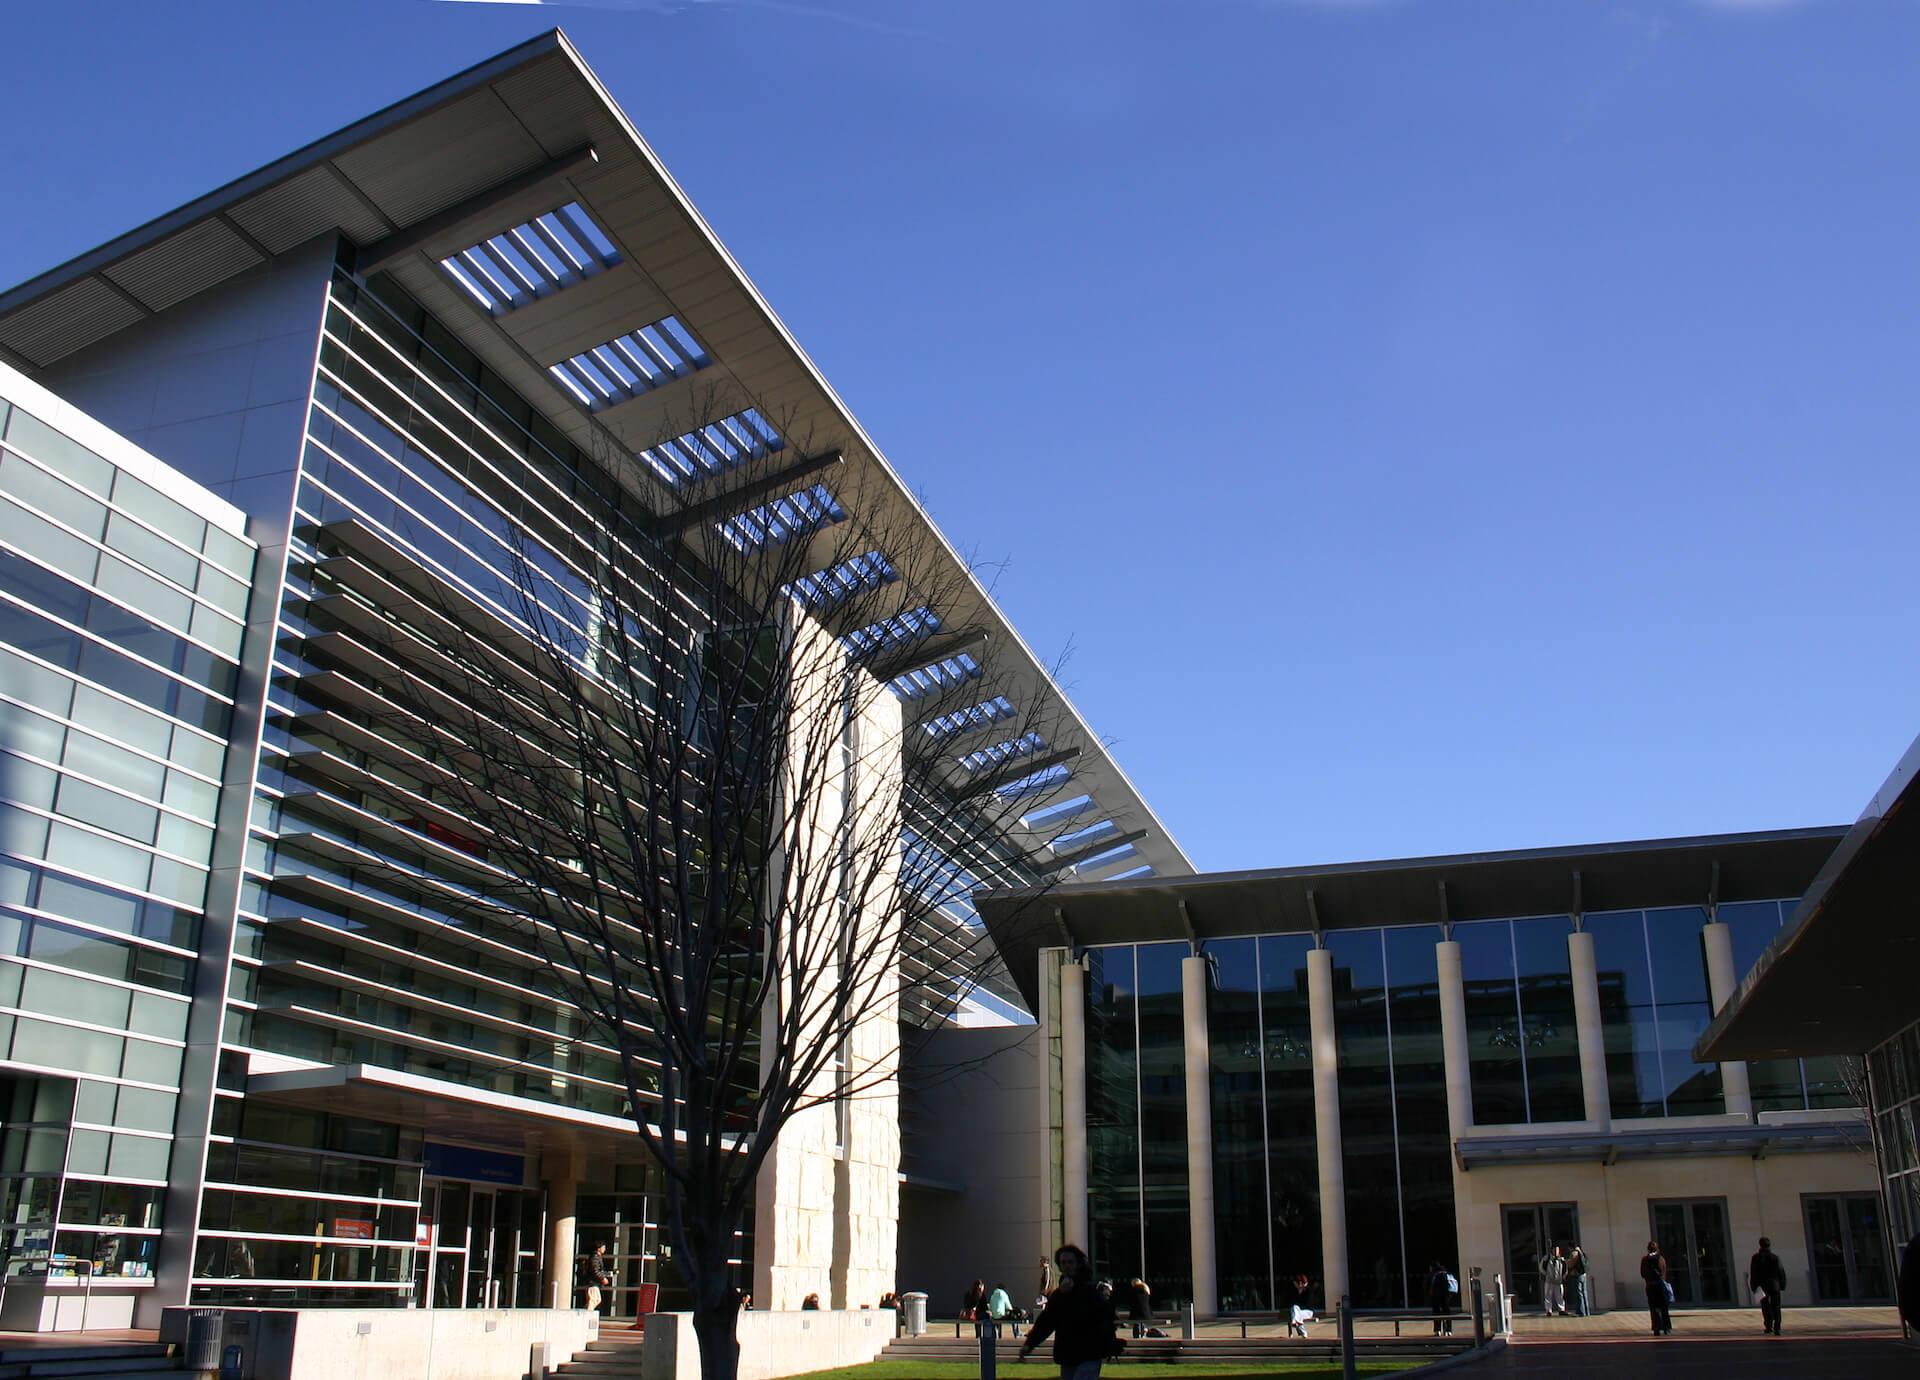 Image:Building & Climate Control – University of Otago